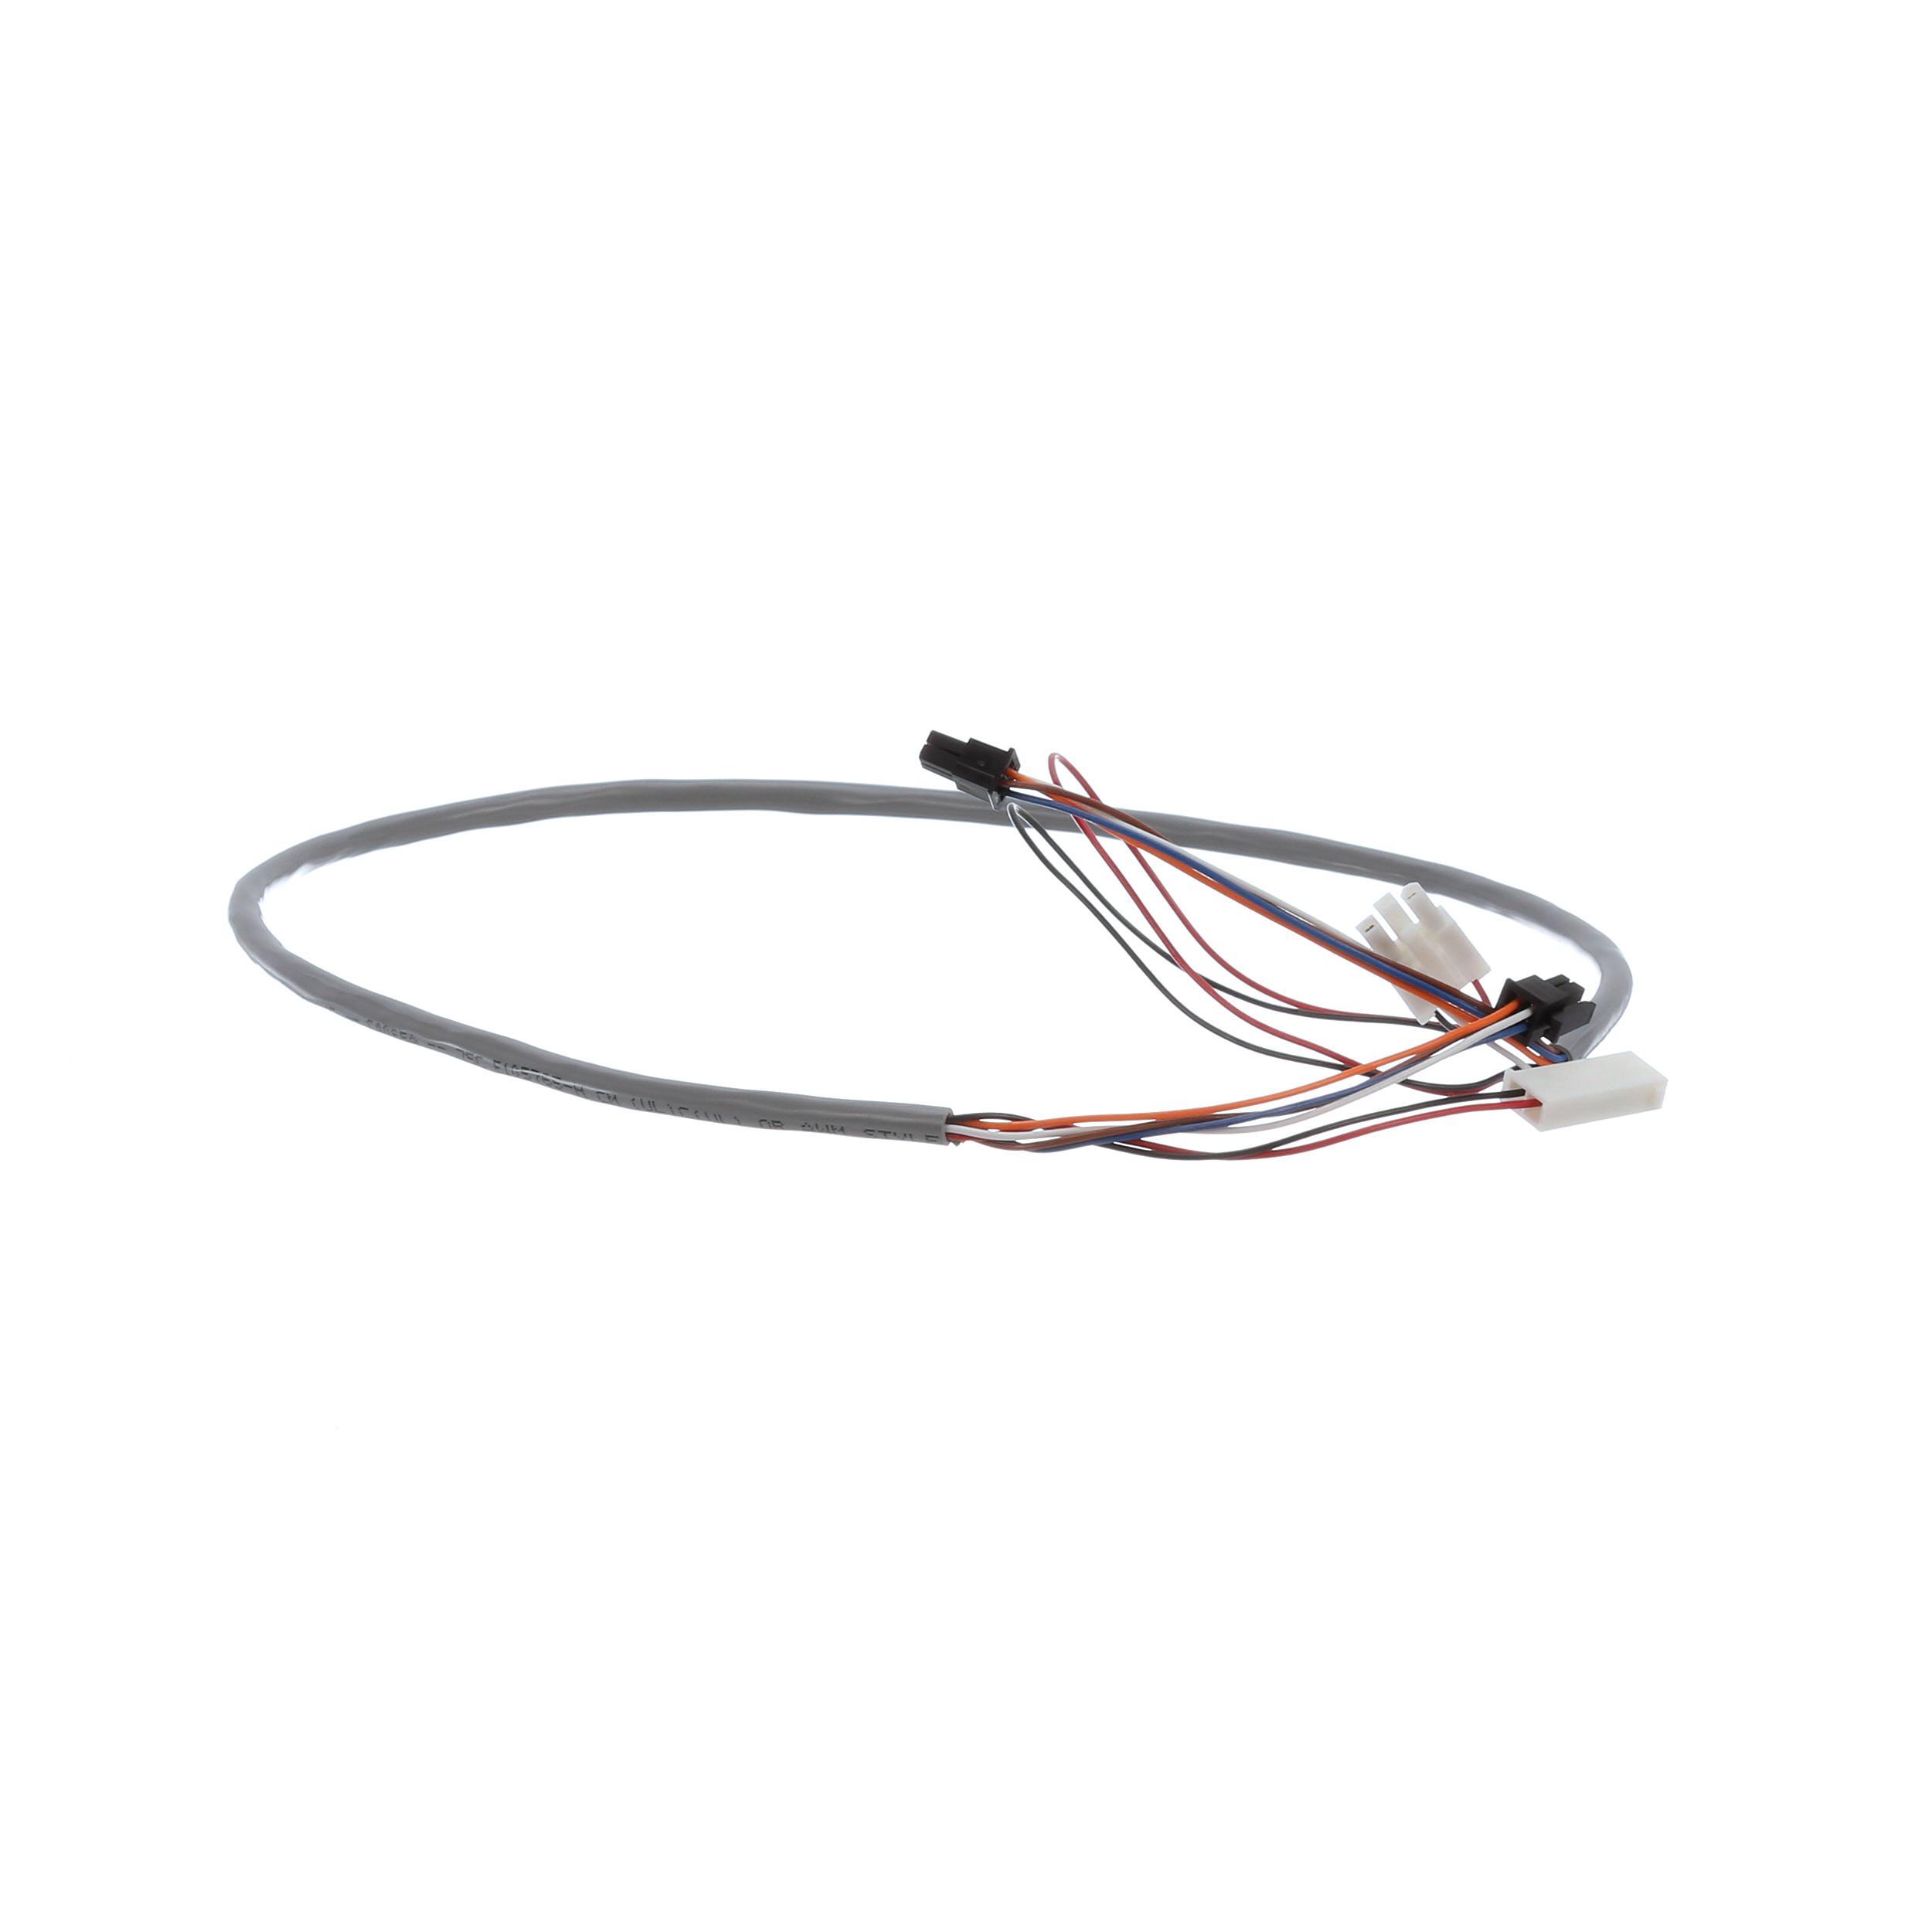 bunn wiring harness  door intrcnct imix